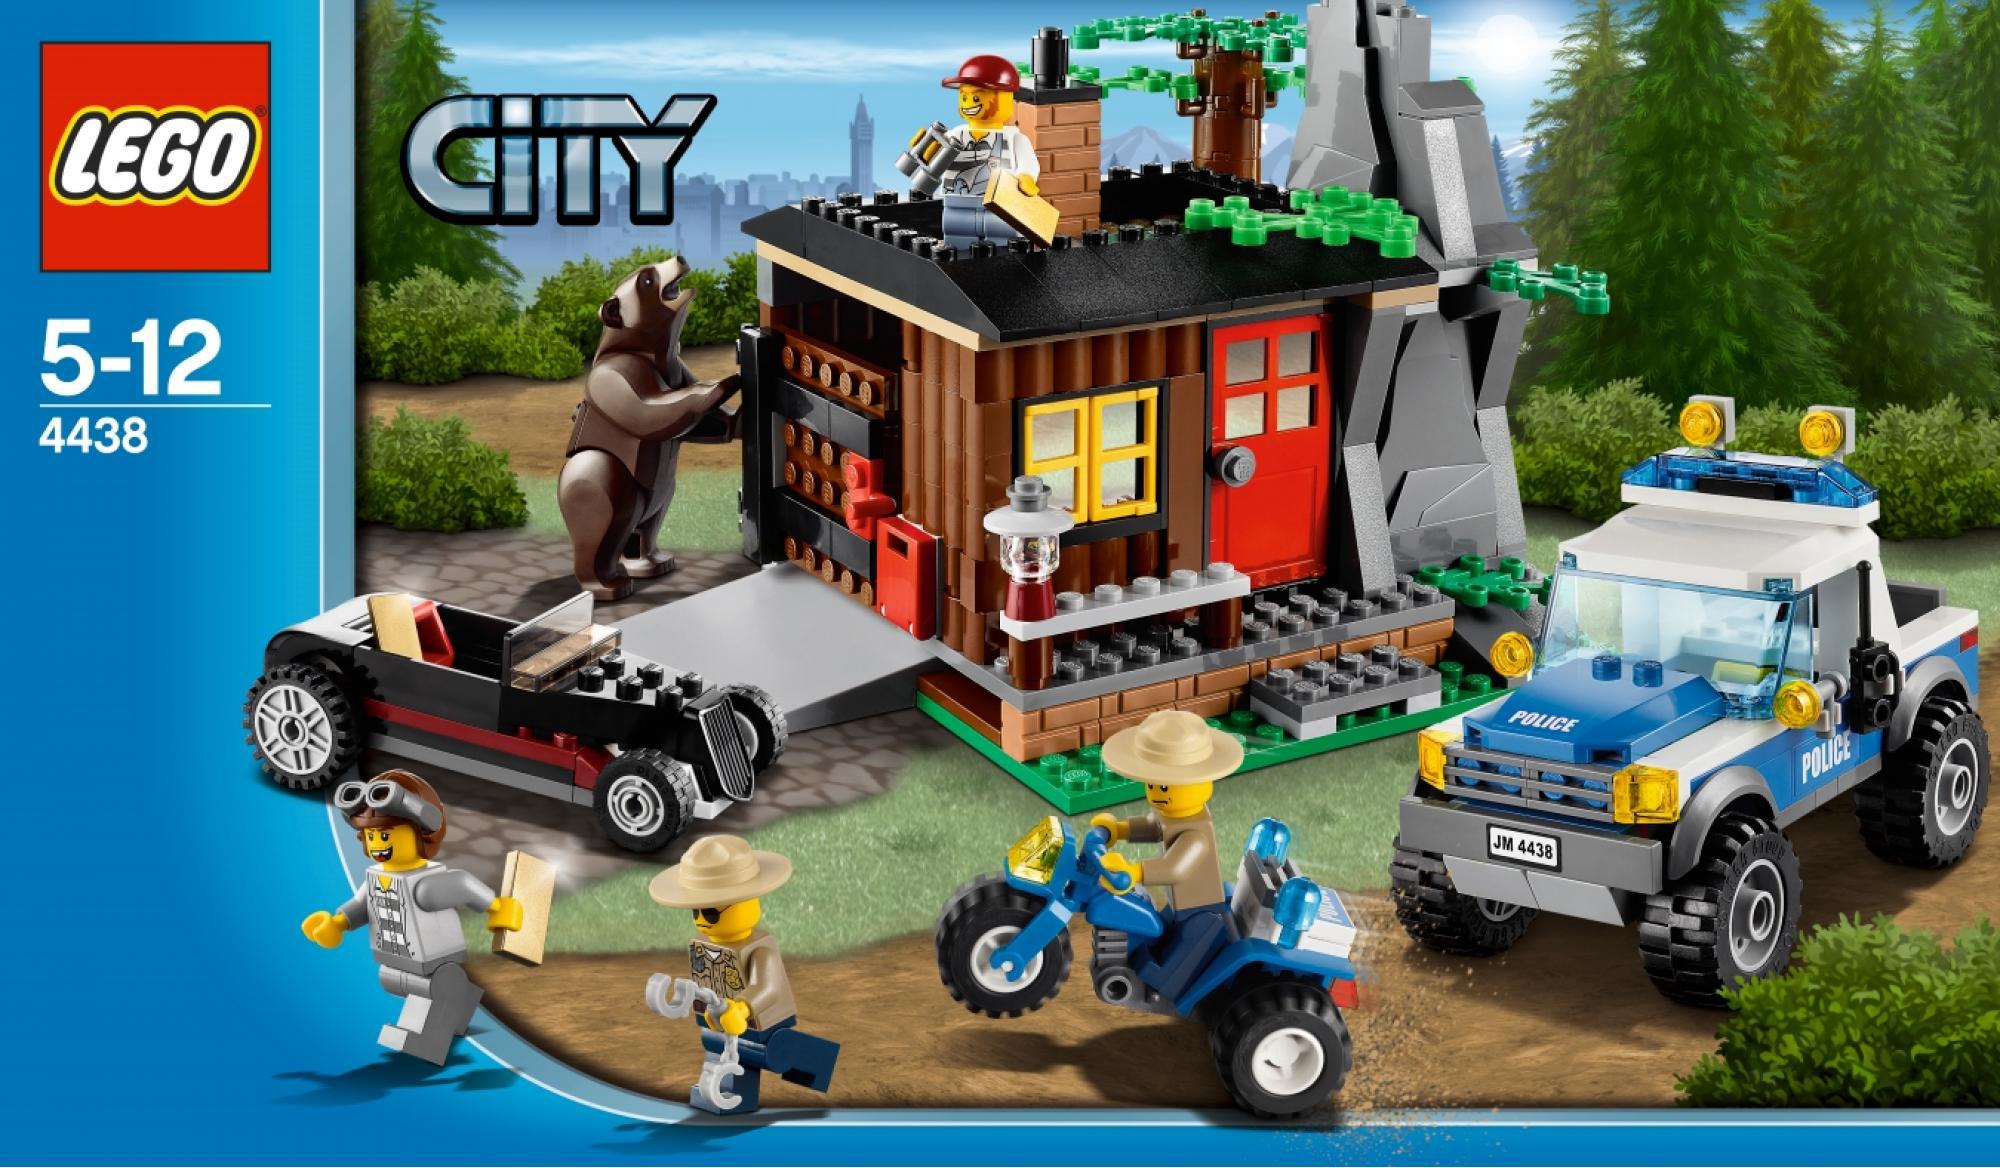 2012 LEGO City sets bring hillbillies, bears, forest fires ...